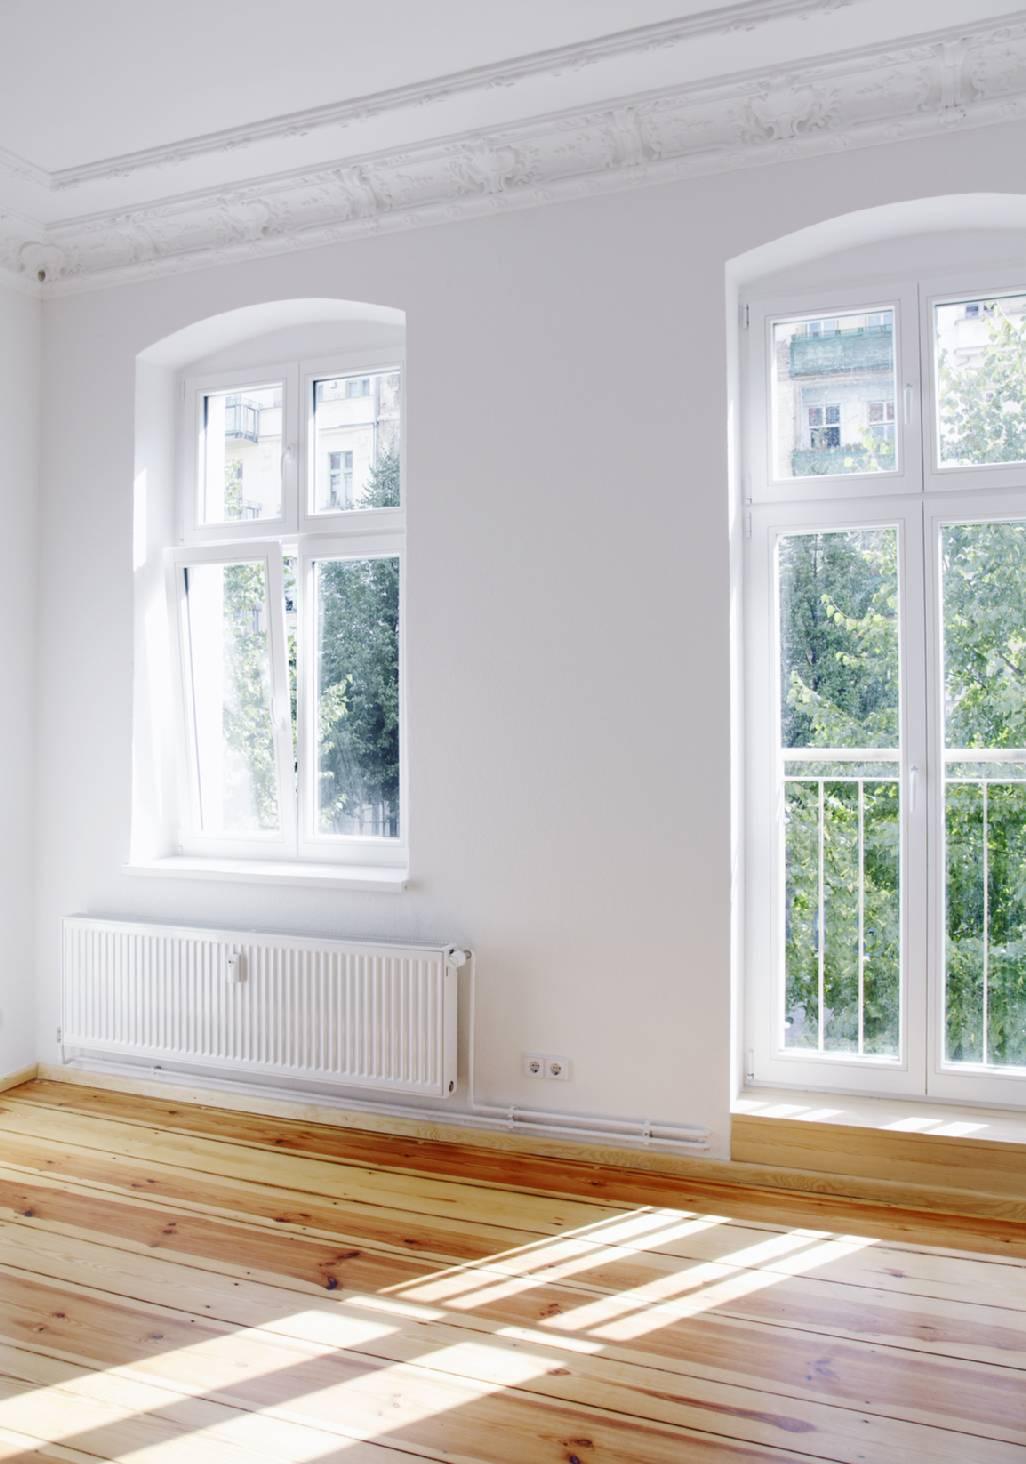 malermeister christian m ller in solingen maler und lackierarbeiten. Black Bedroom Furniture Sets. Home Design Ideas